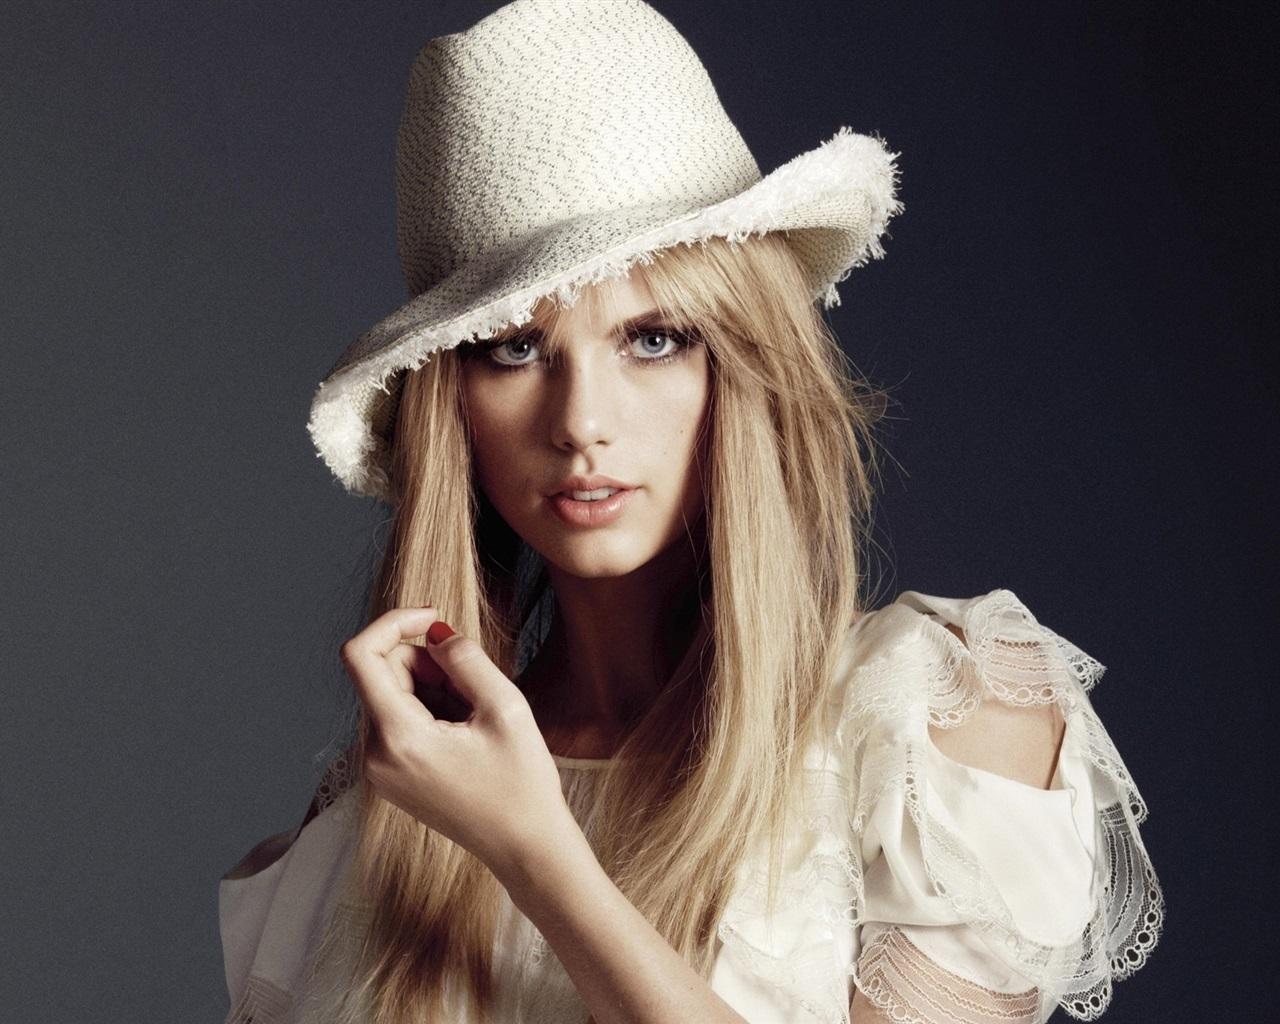 Taylor-Swift-46_1280x1024.jpg Taylor Swift